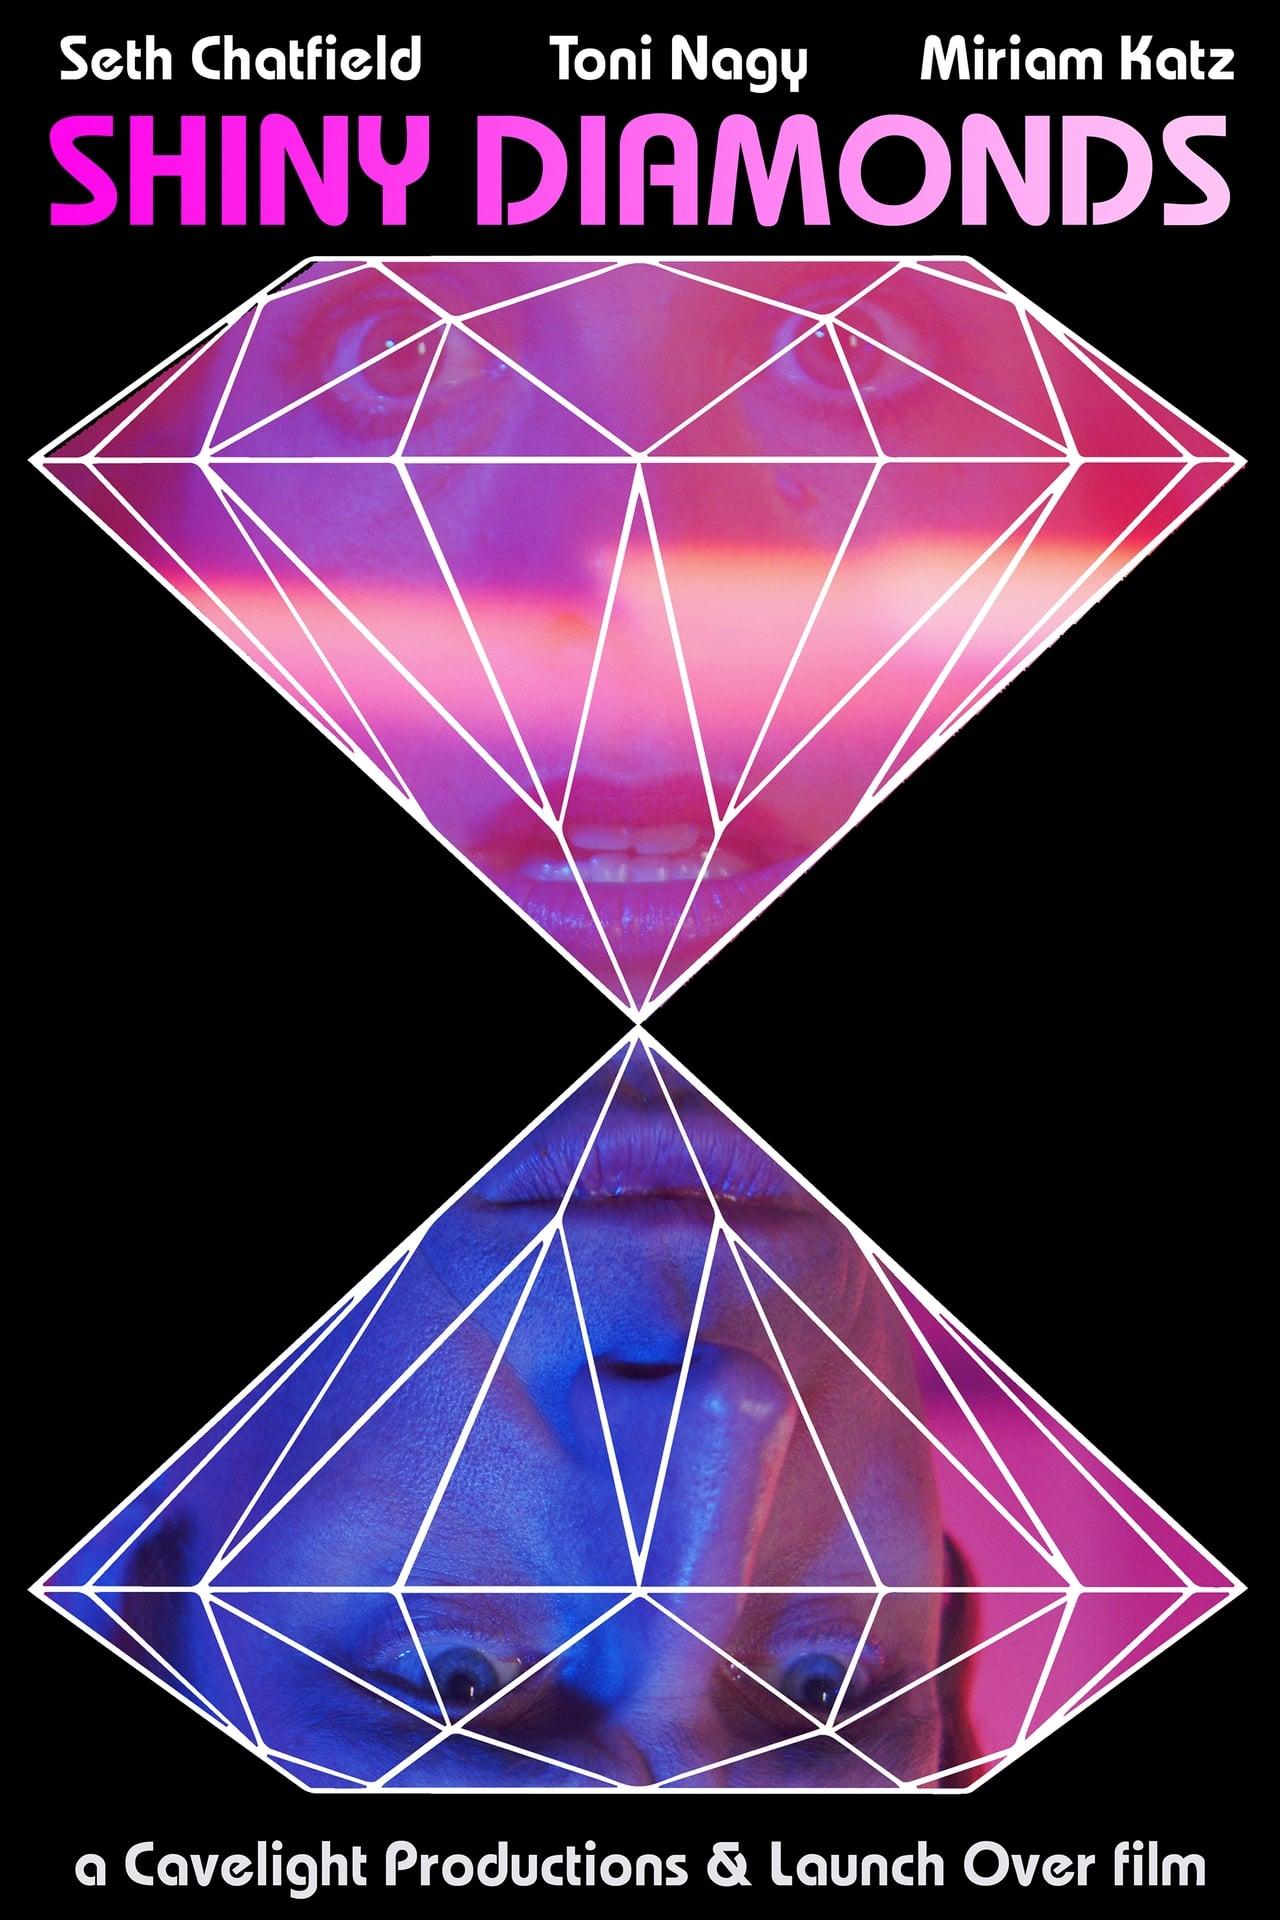 Shiny Diamonds (2020)